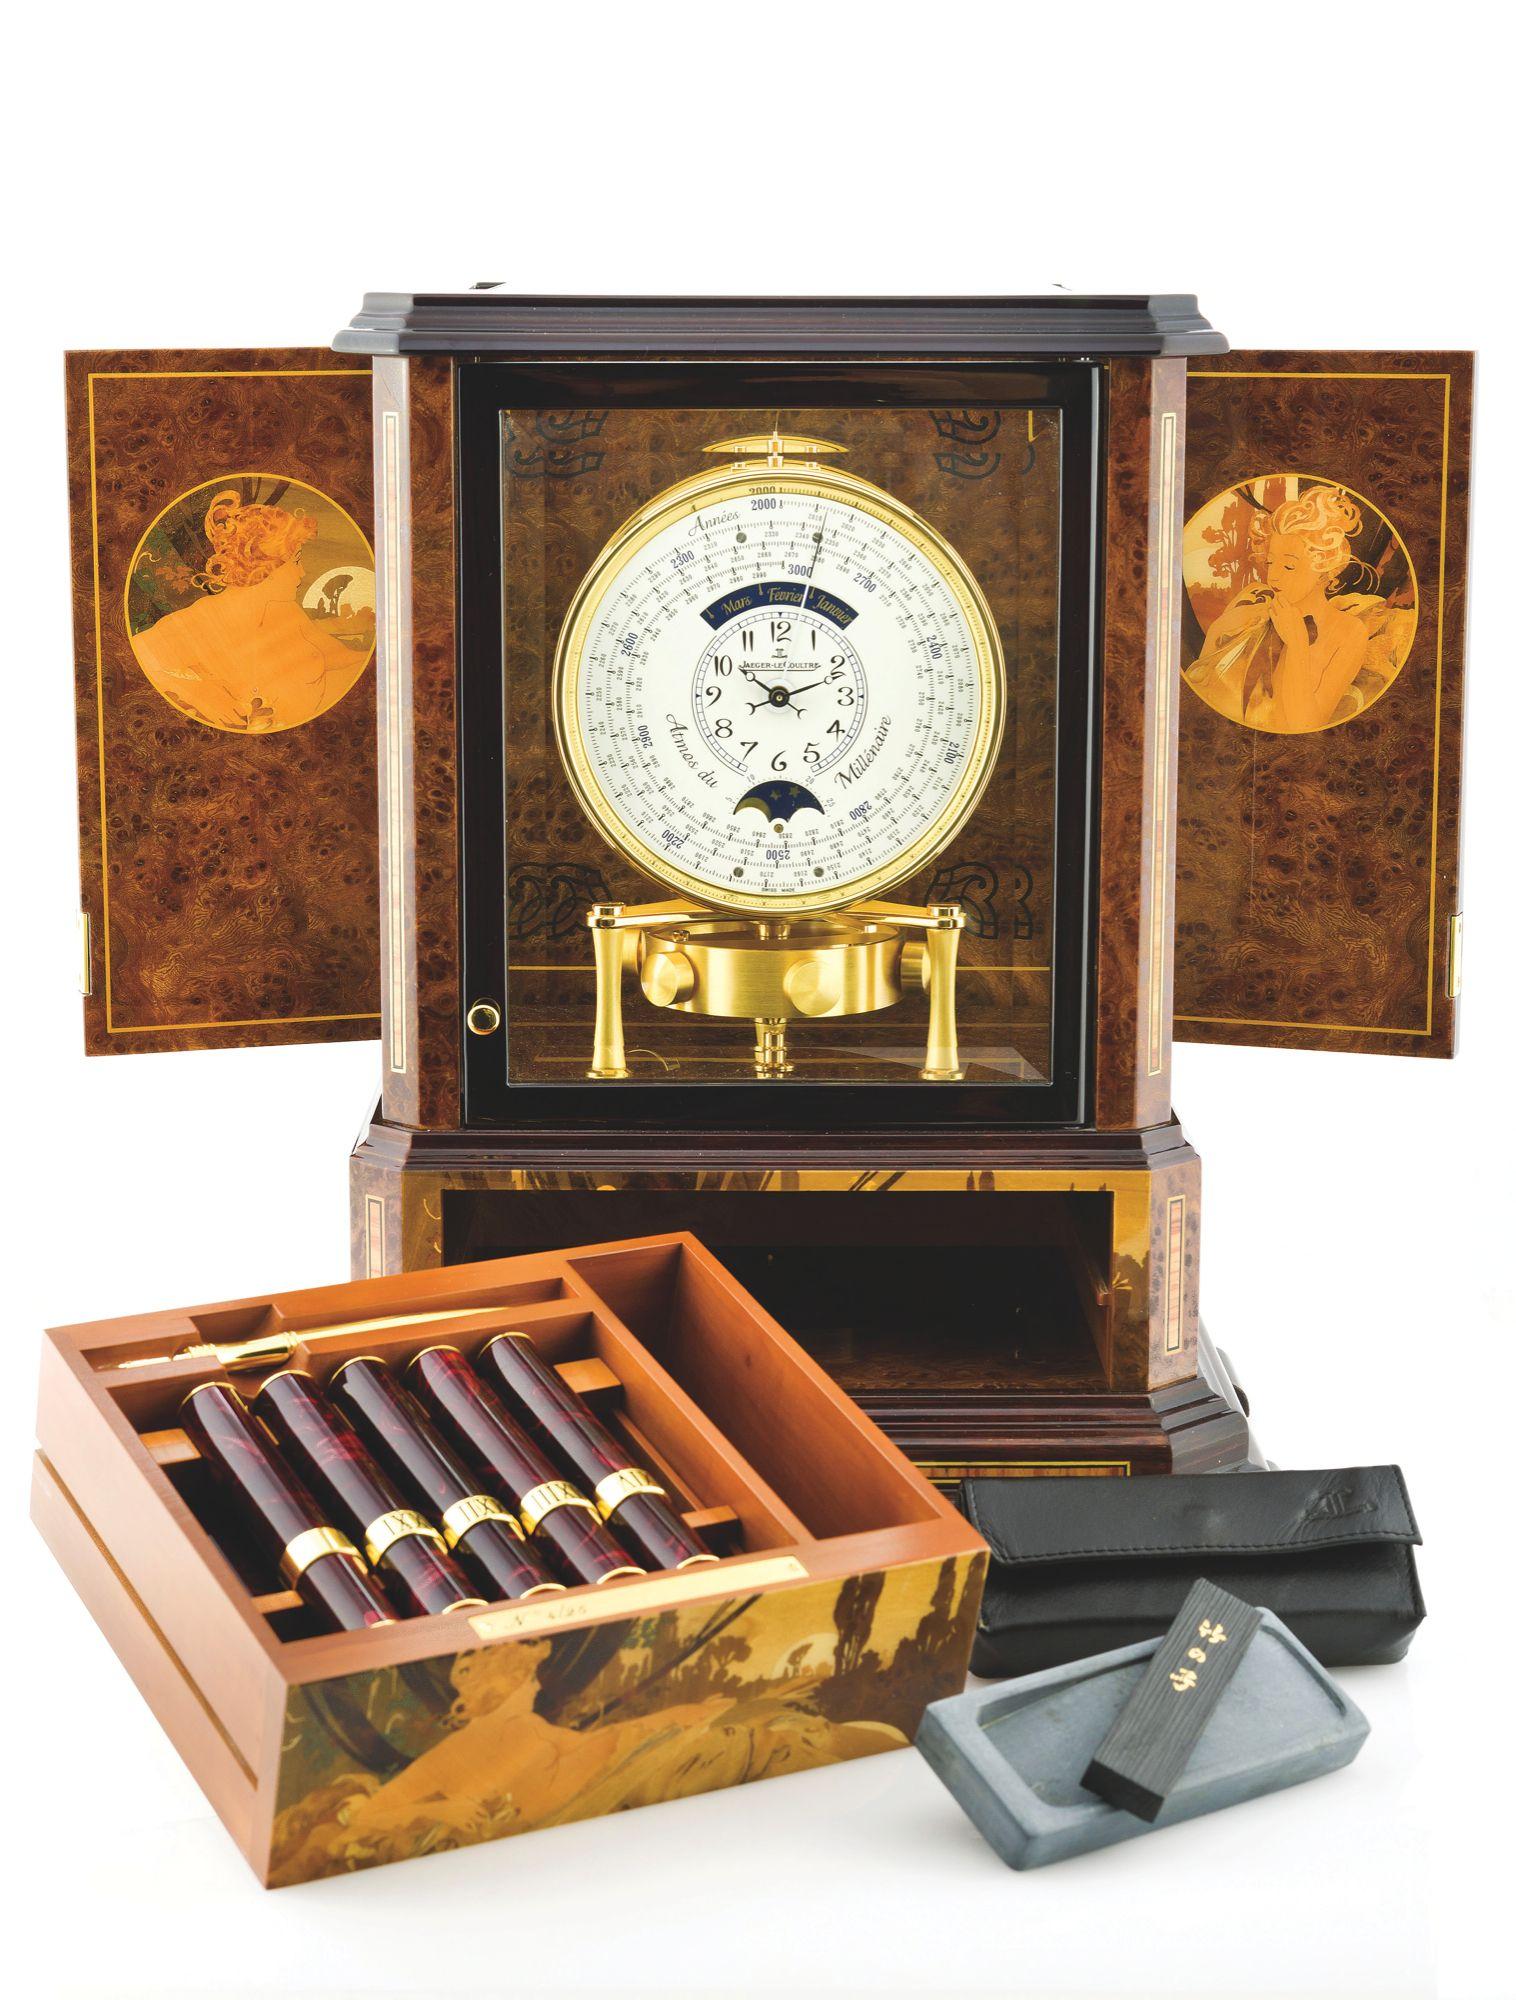 5c9628fd419 Pin de Minute Dreamer em Watches